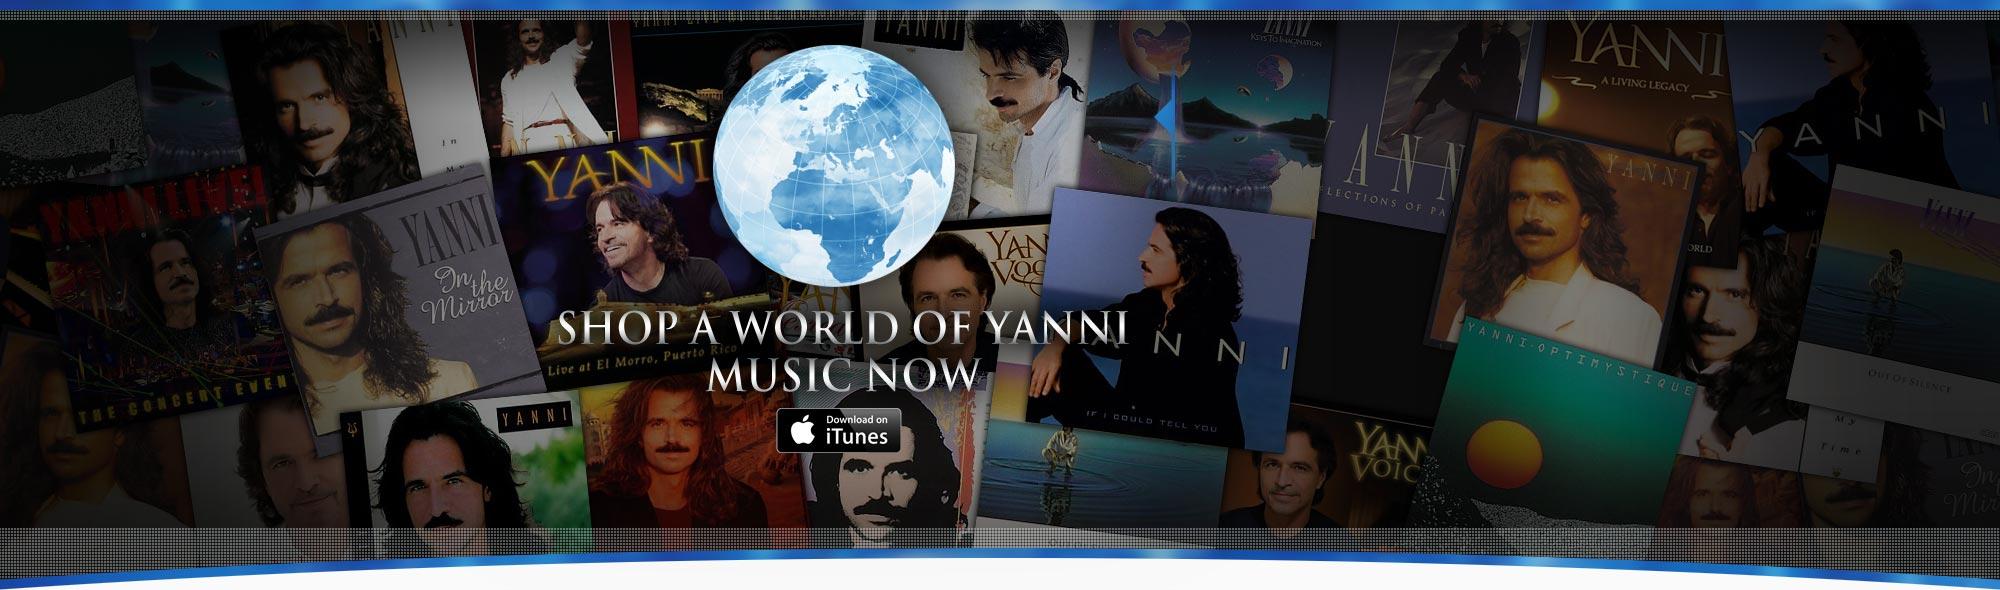 Website Yanni